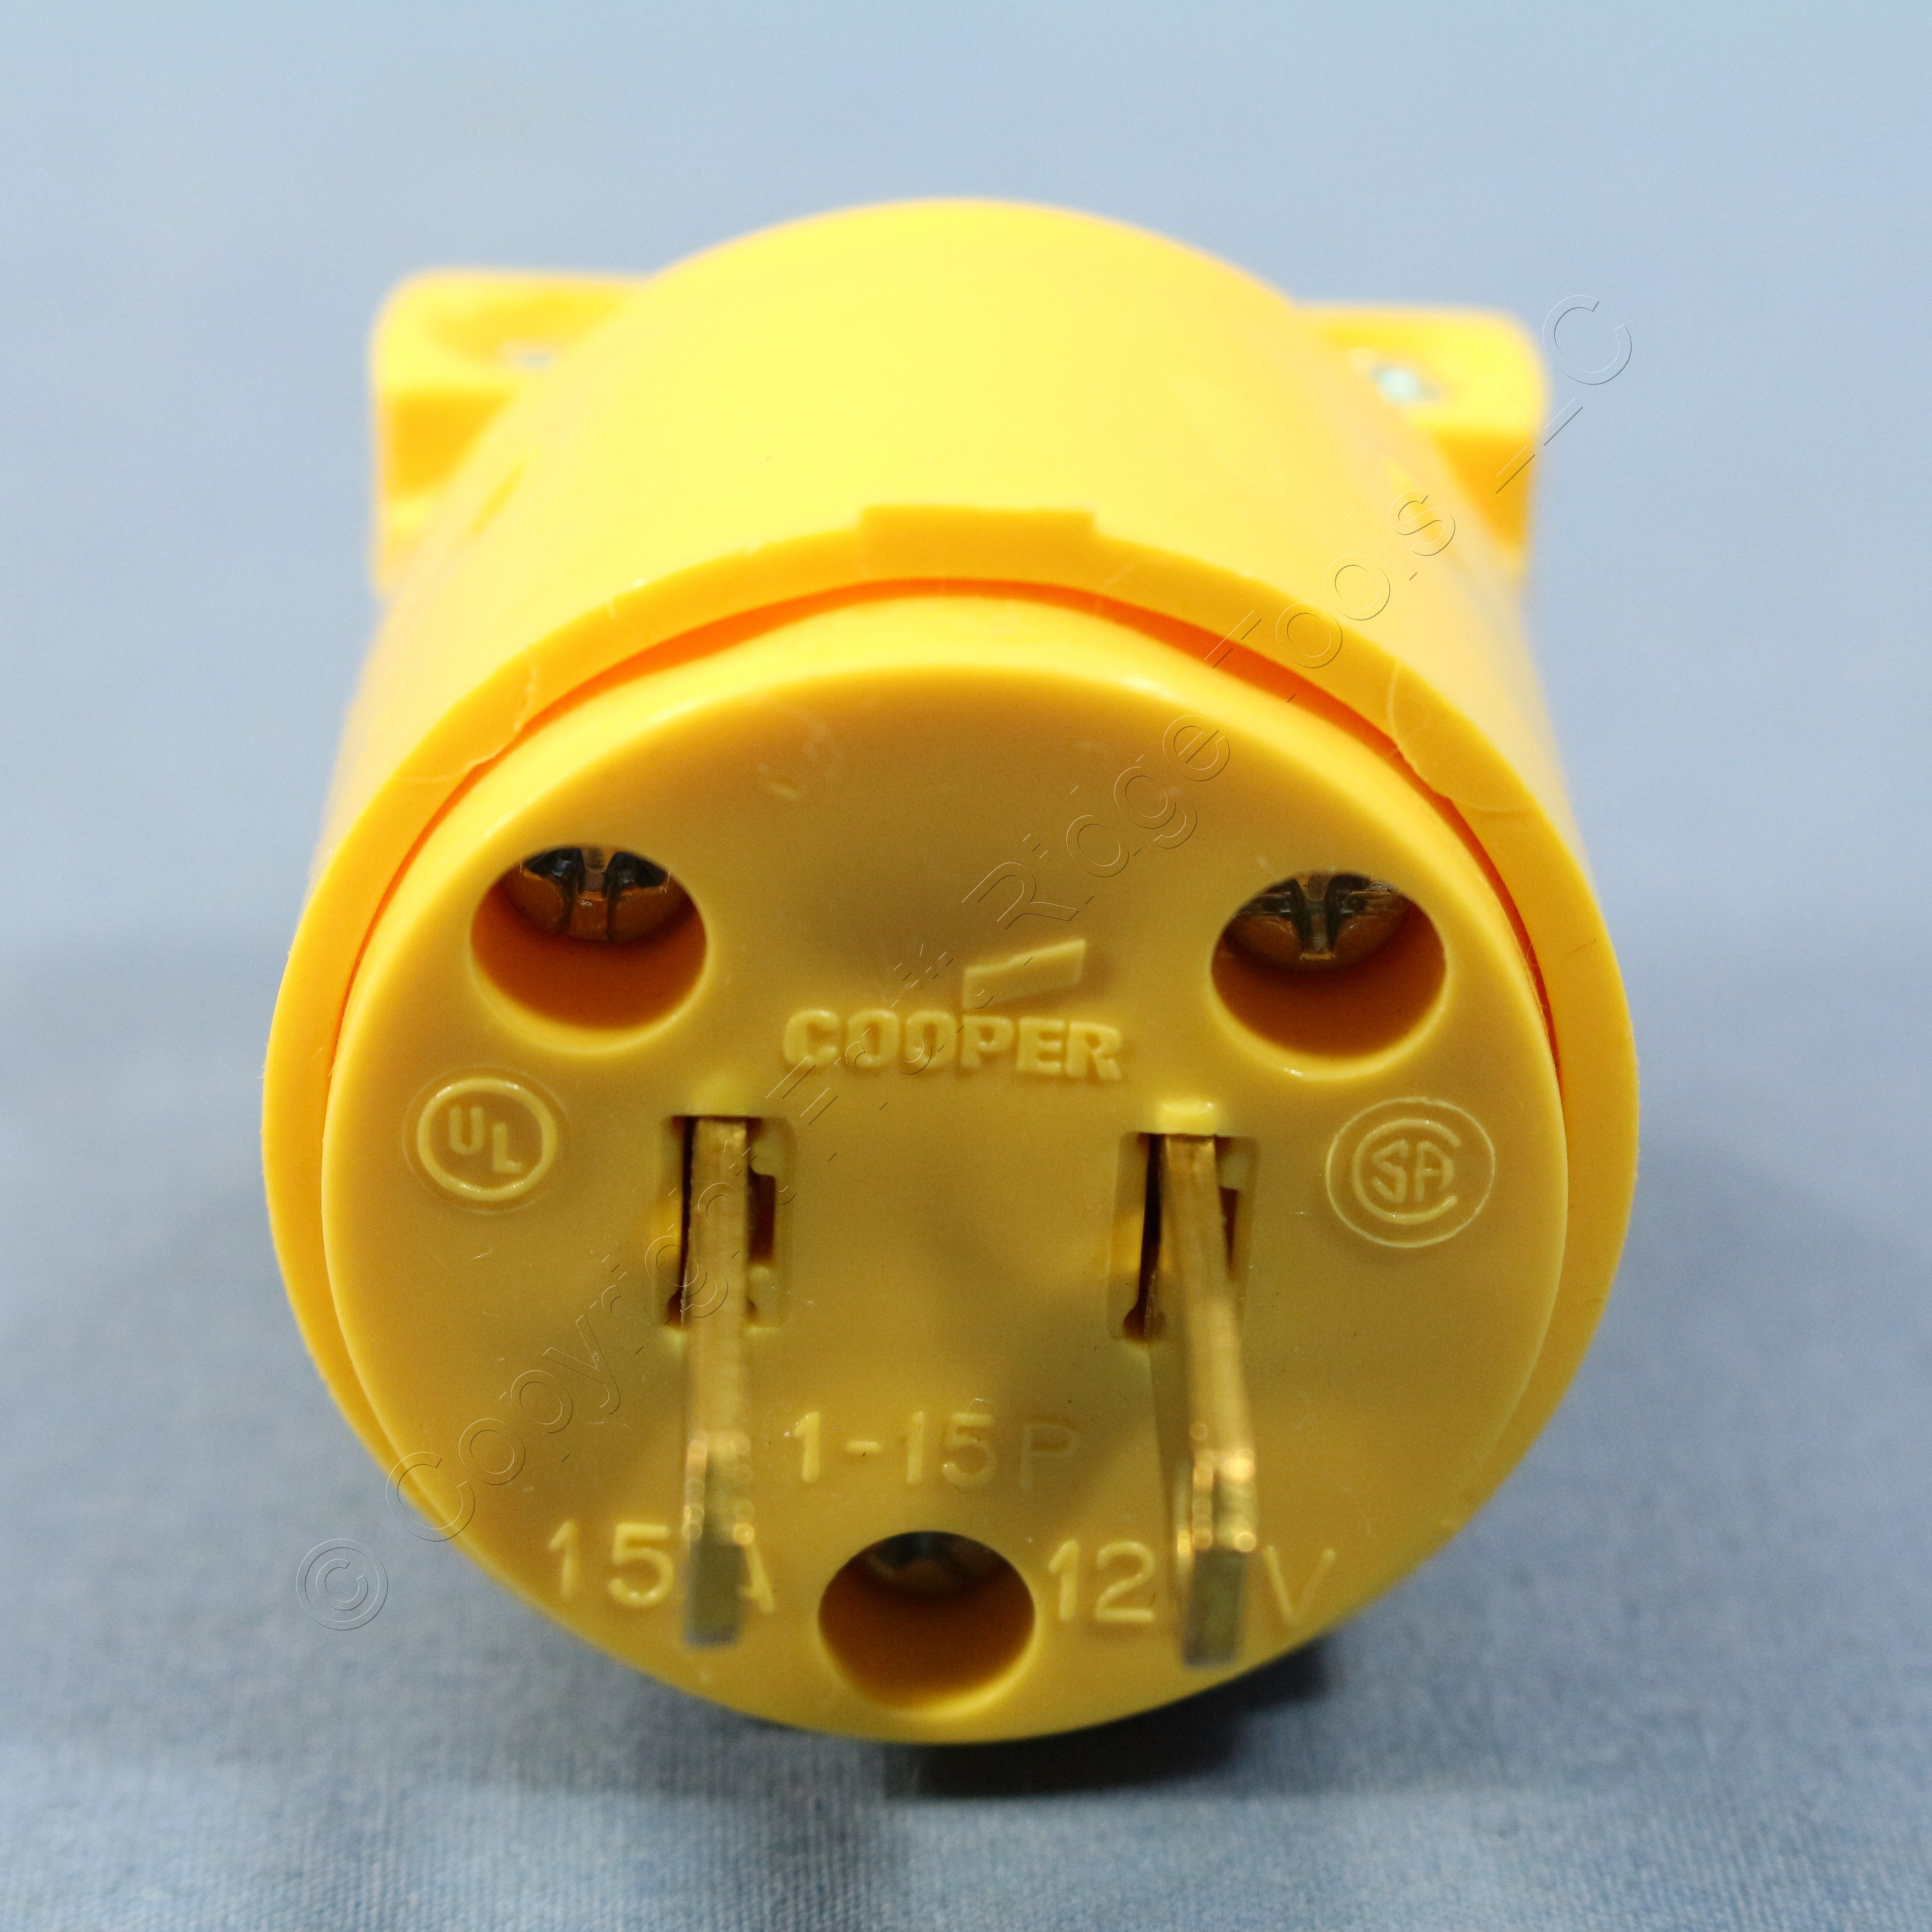 Cooper Yellow Vinyl Straight Blade Plug 15a 125v Nema 1 15p No Wiring Devices 20amp 125volt 3wire Grounding Ground Bulk 4862